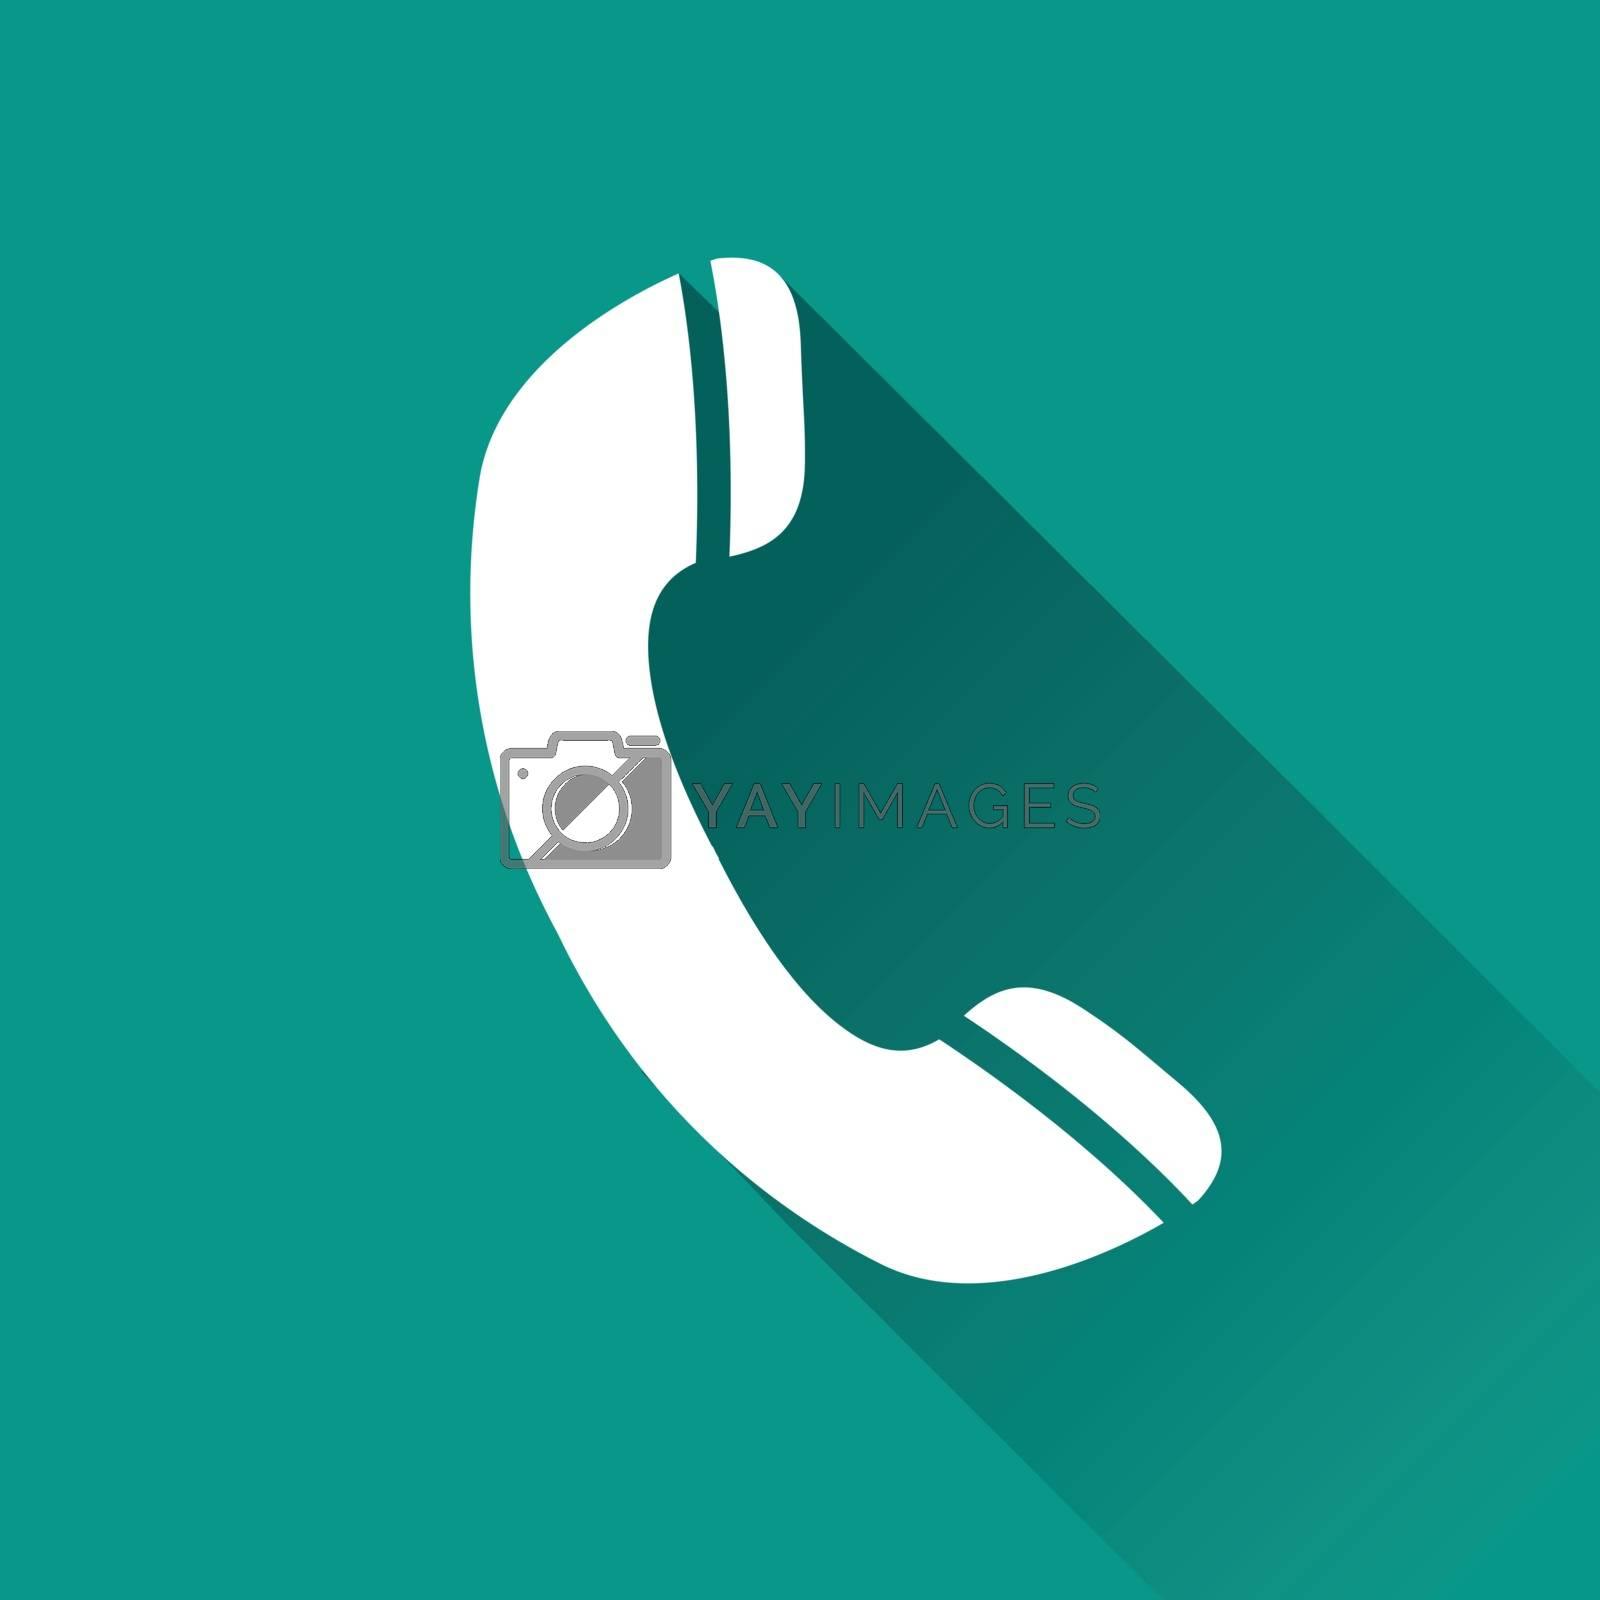 illustration of phone flat design icon isolated